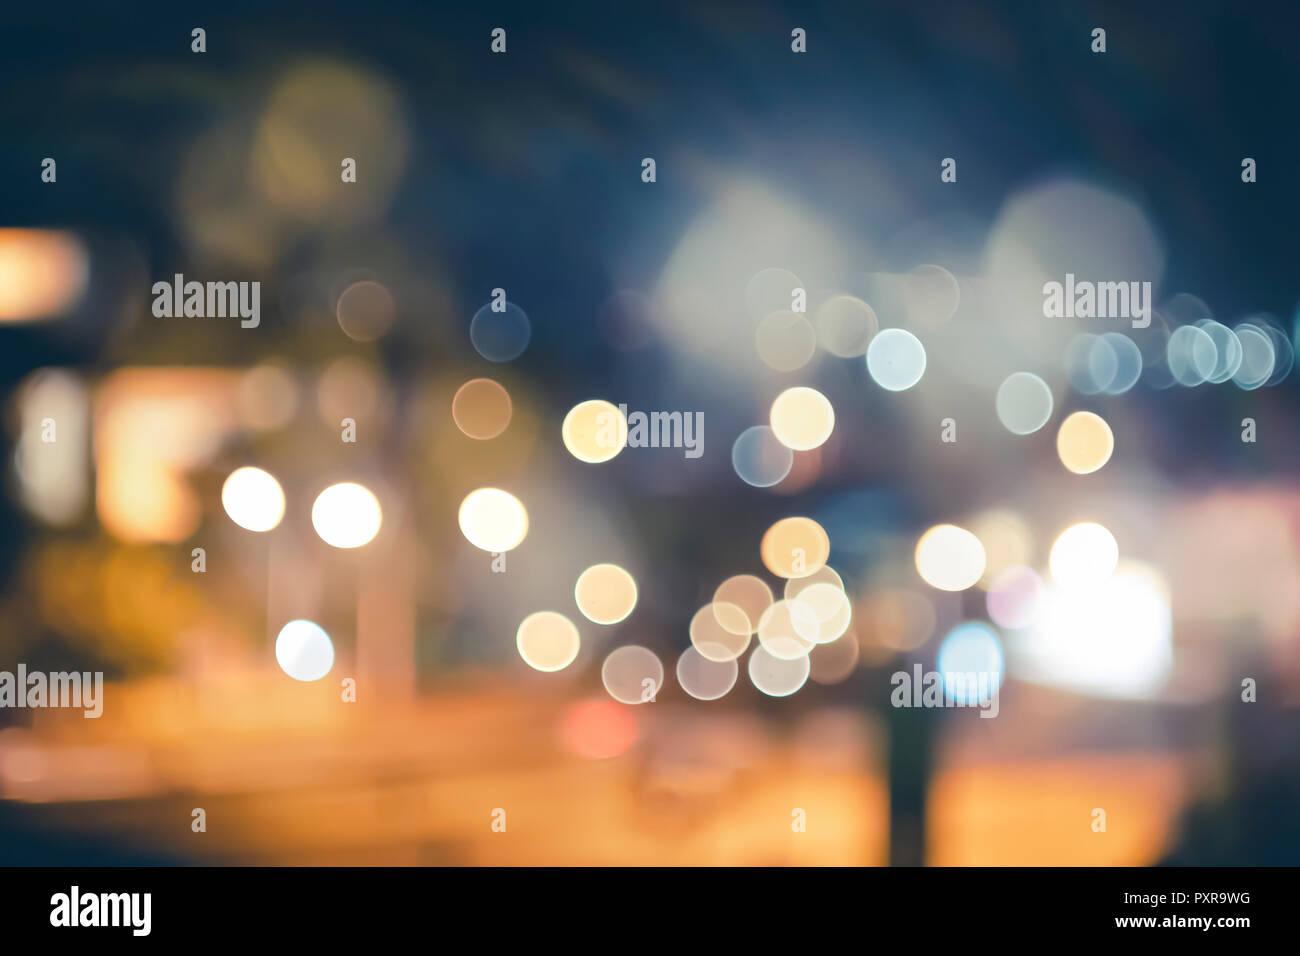 night city street lights bokeh background,lights blurred bokeh background for your design vintage or retro color - Stock Image